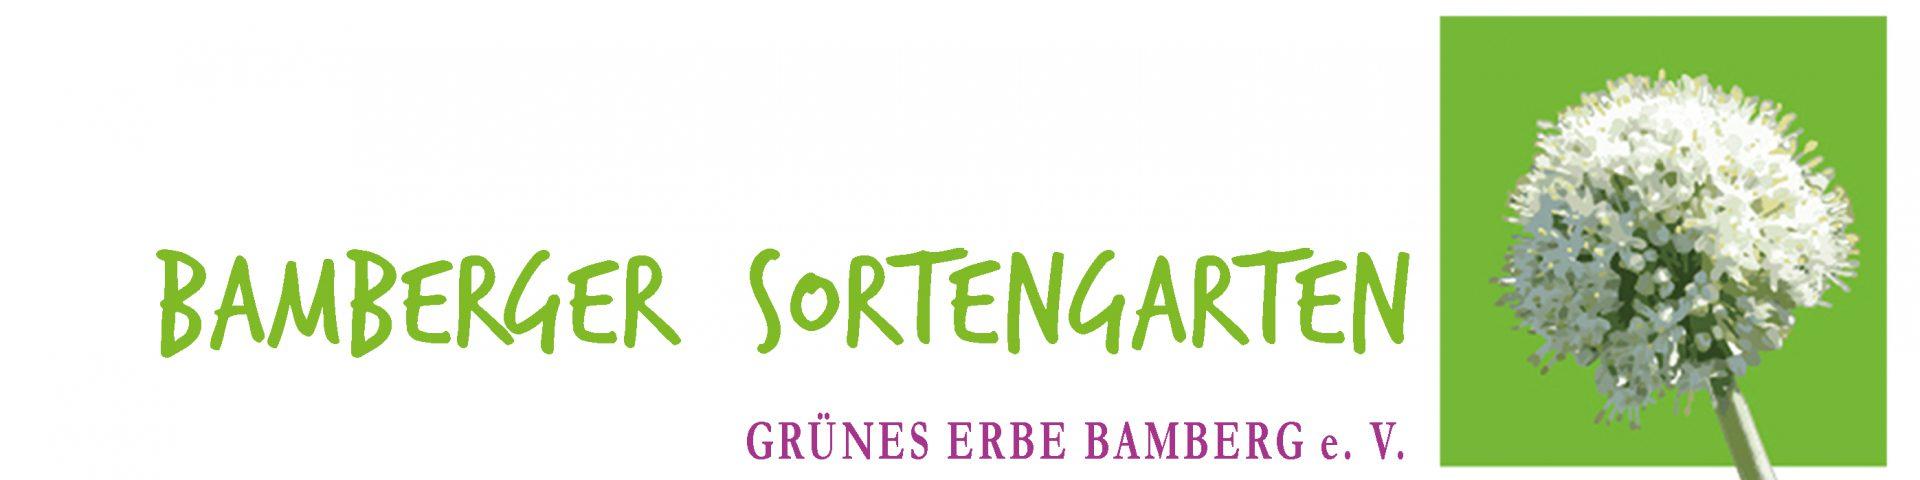 Bamberger Sortengarten